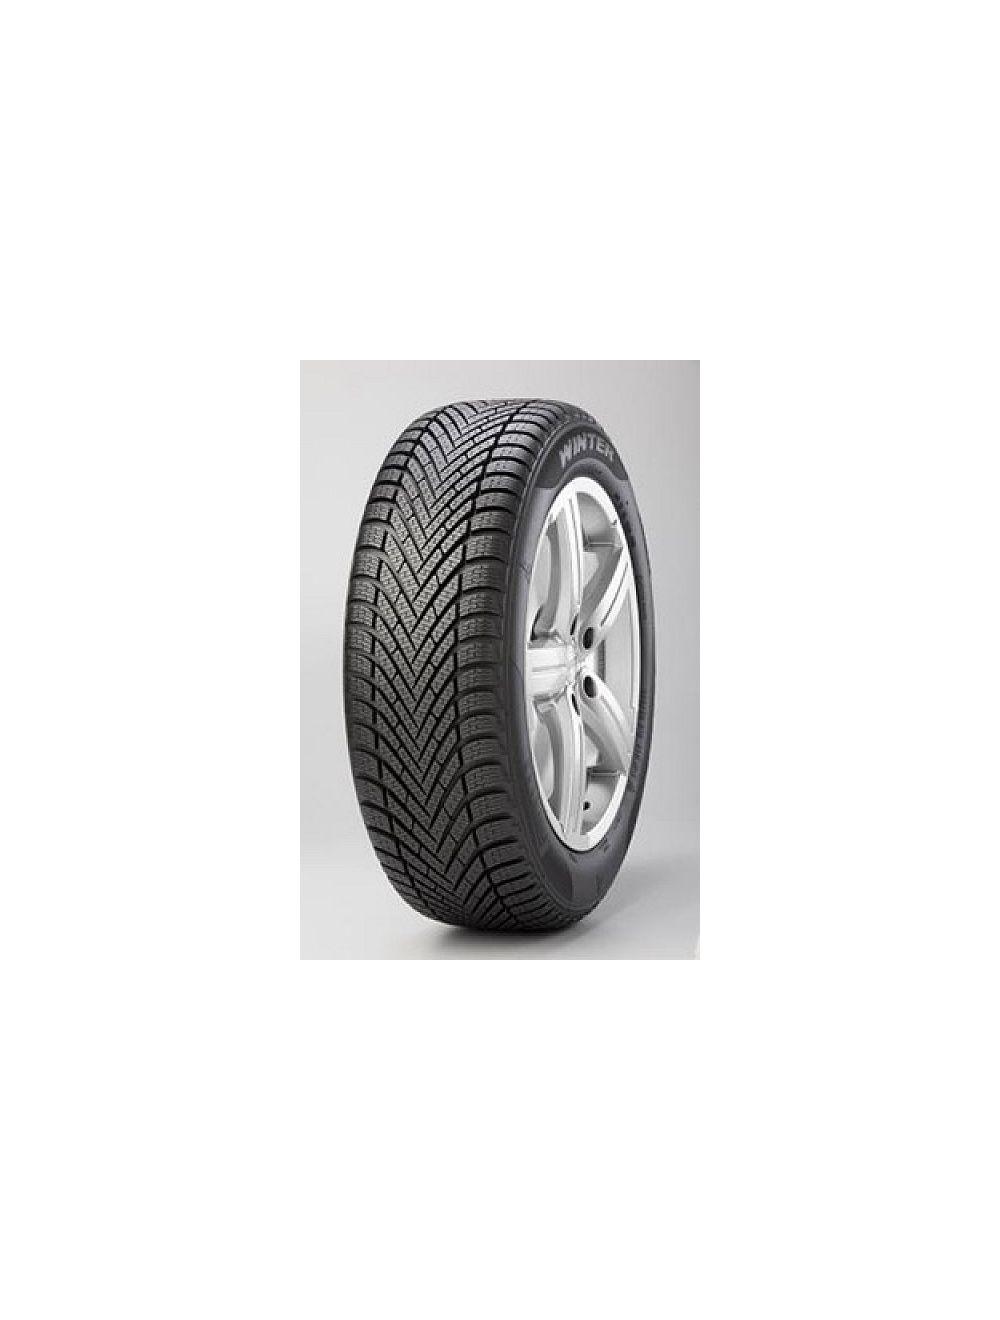 Pirelli 185/60R15 T Cinturato Winter XL Téli gumi